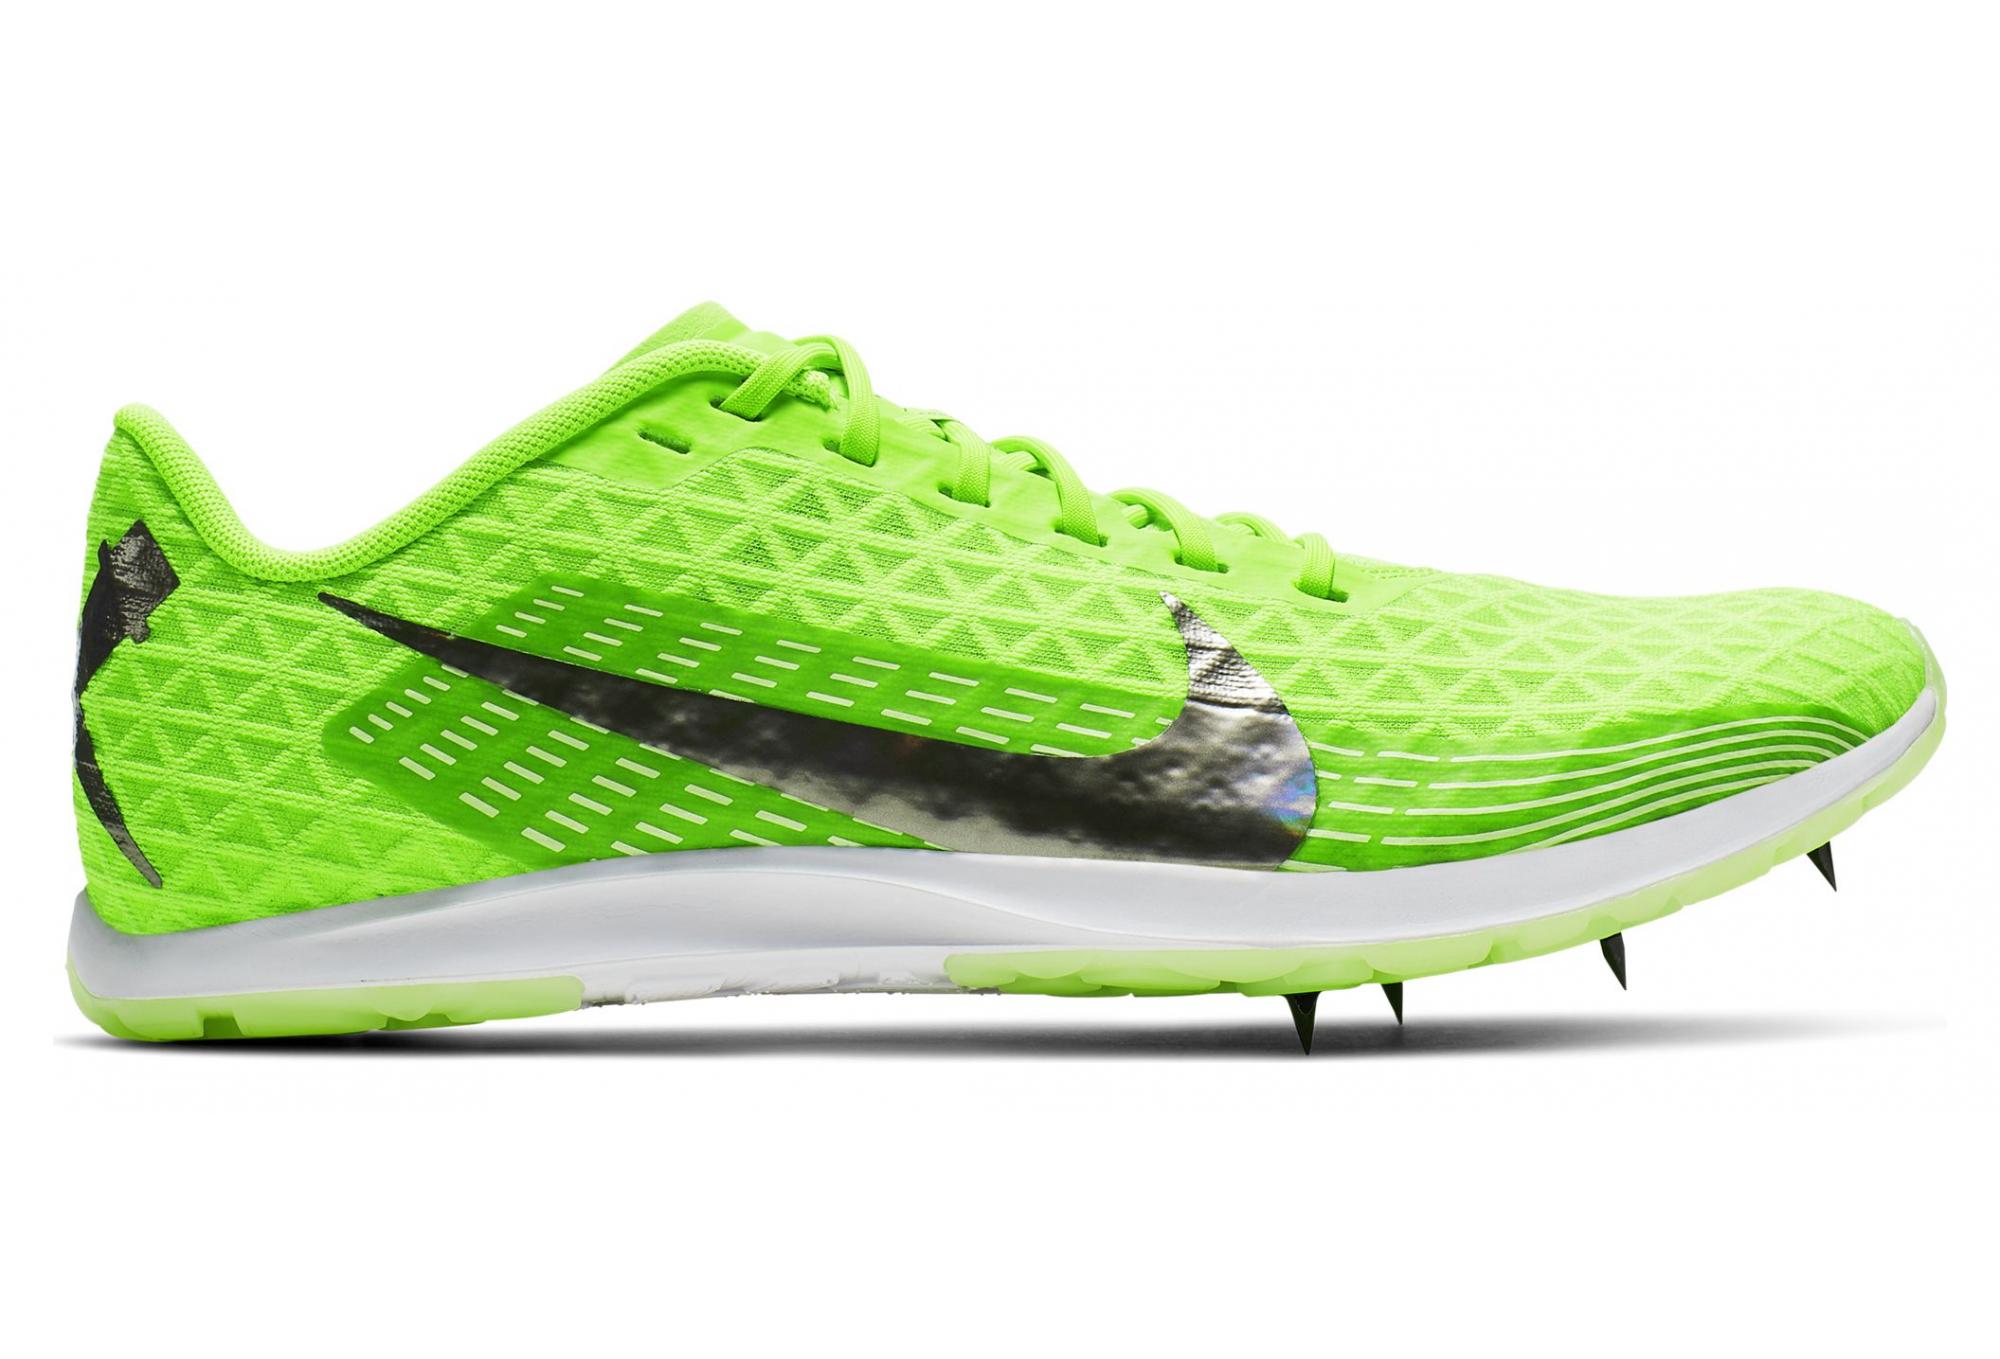 Nike Running Shoes Zoom Rival Xc Yellow Black Alltricks De